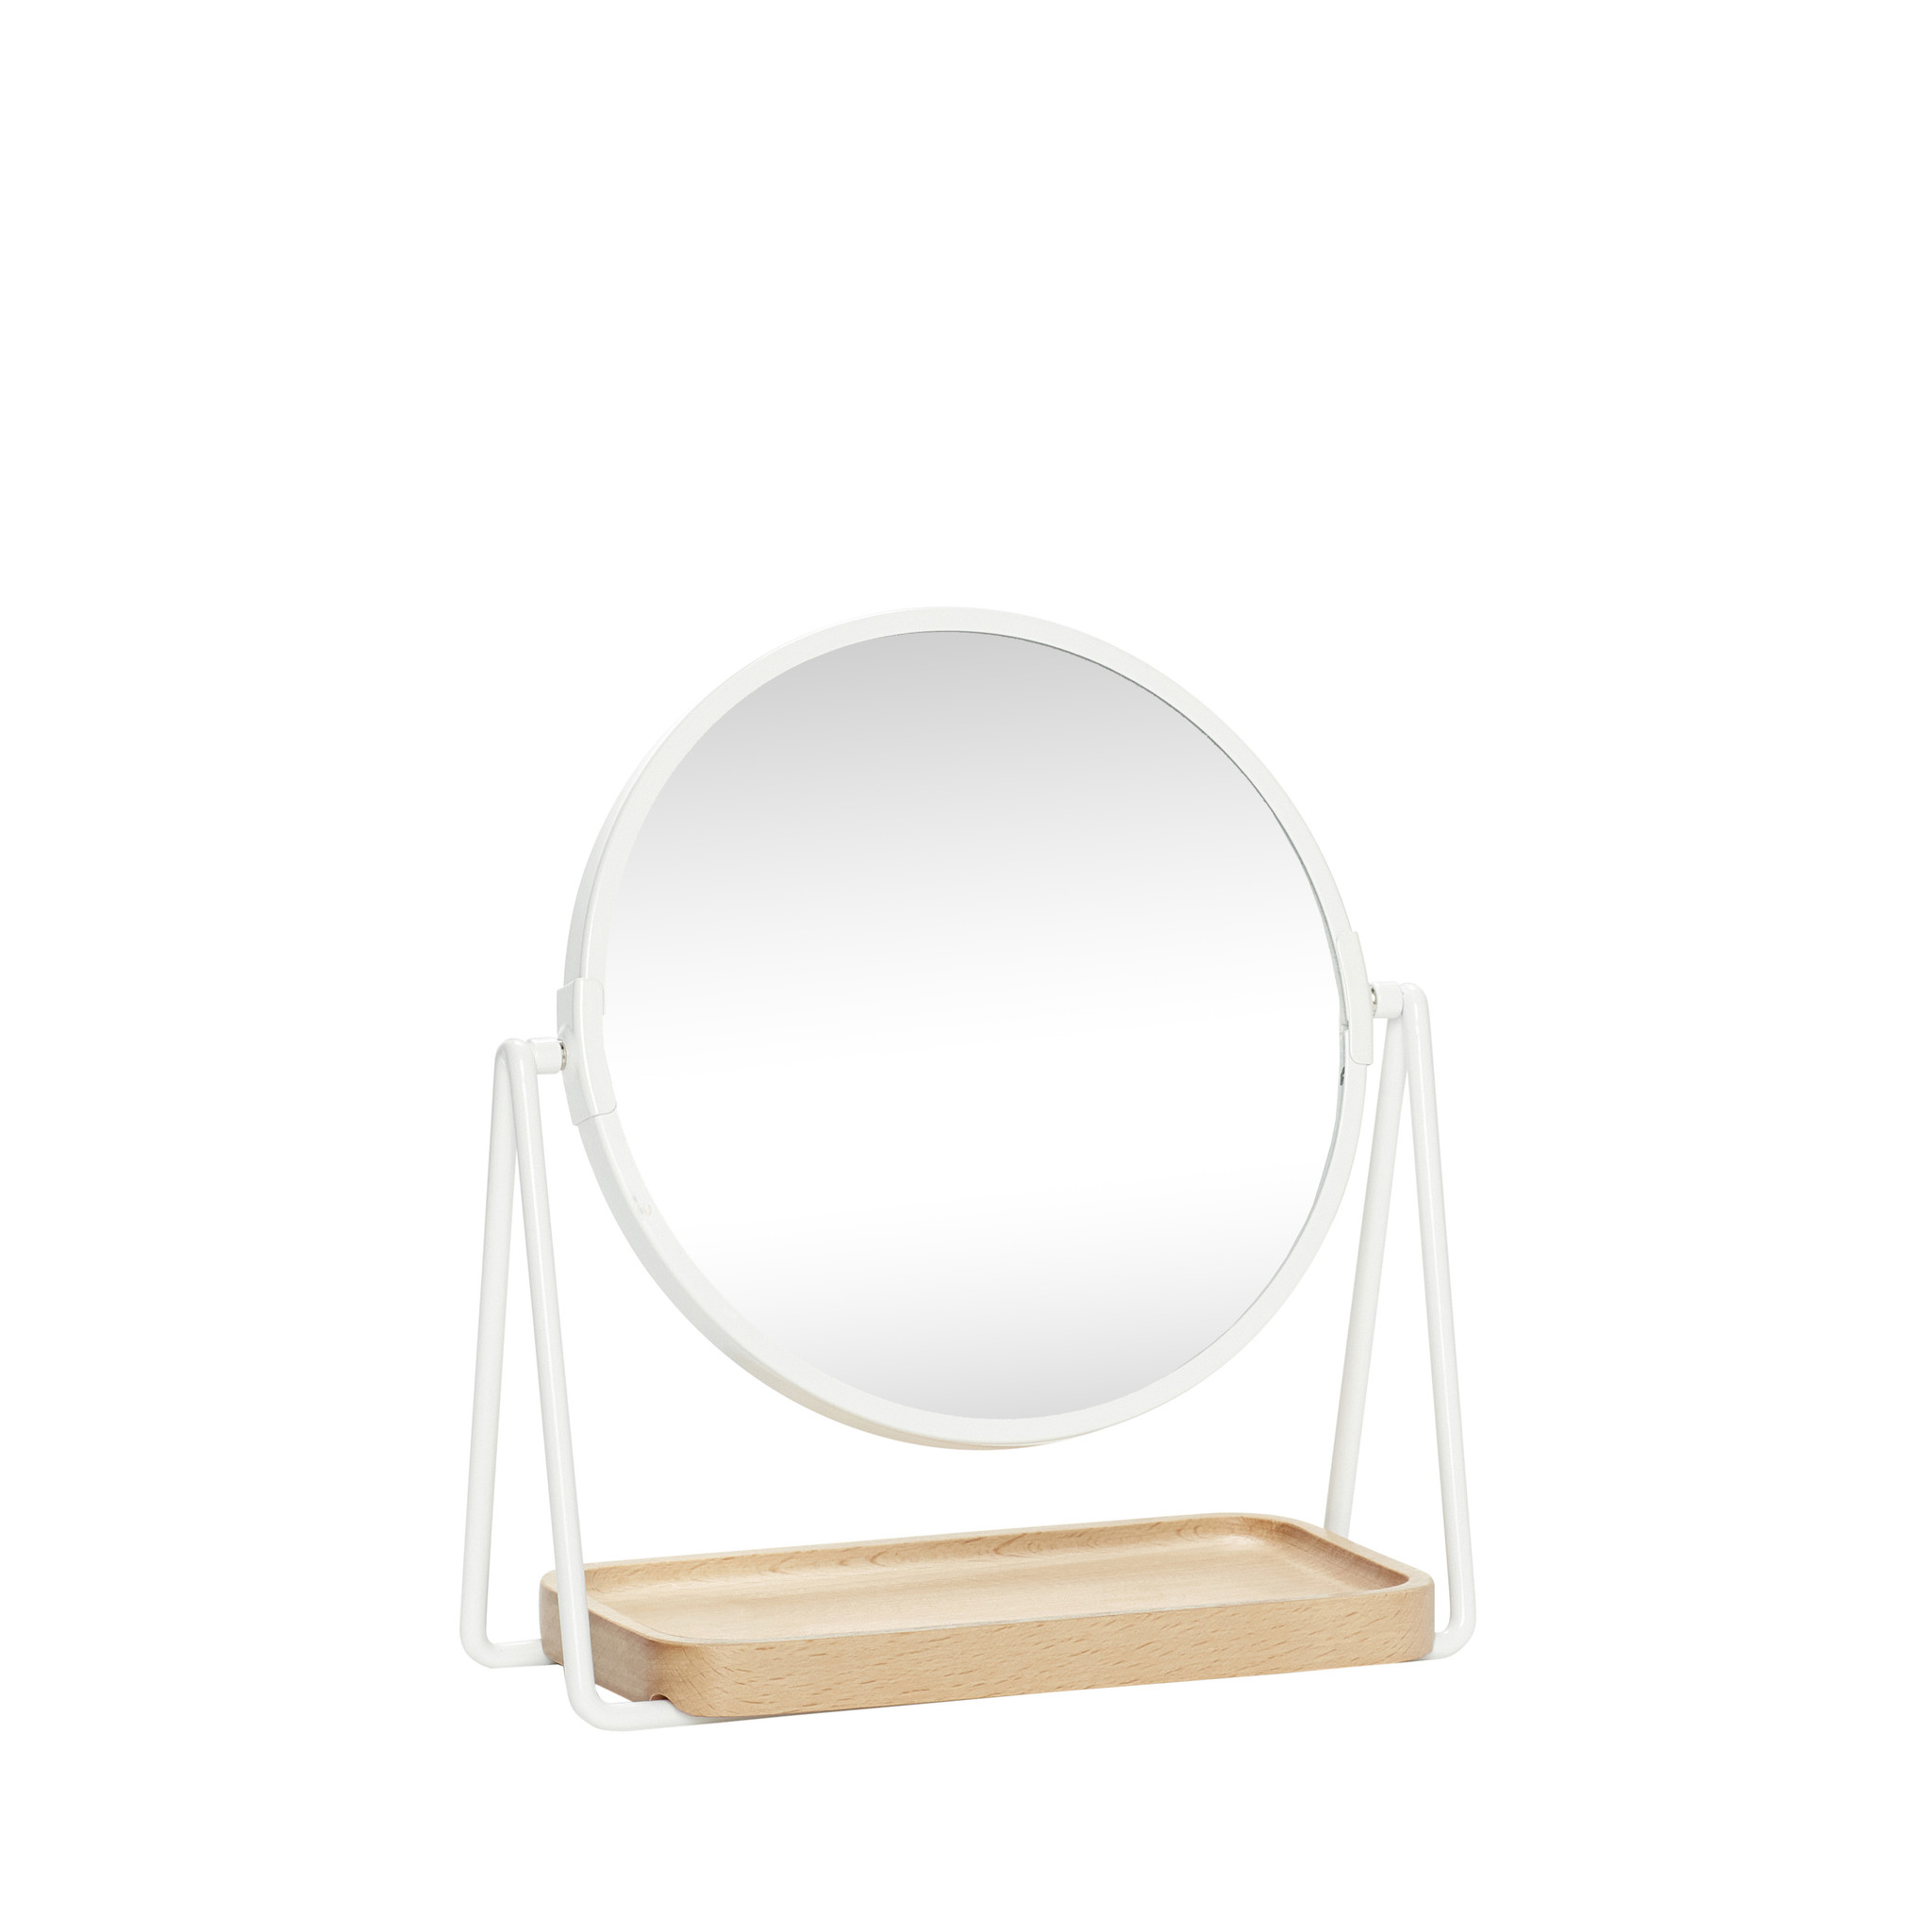 Hubsch Tafelspiegel met dienblad, rond, hout / metaal / glas, wit